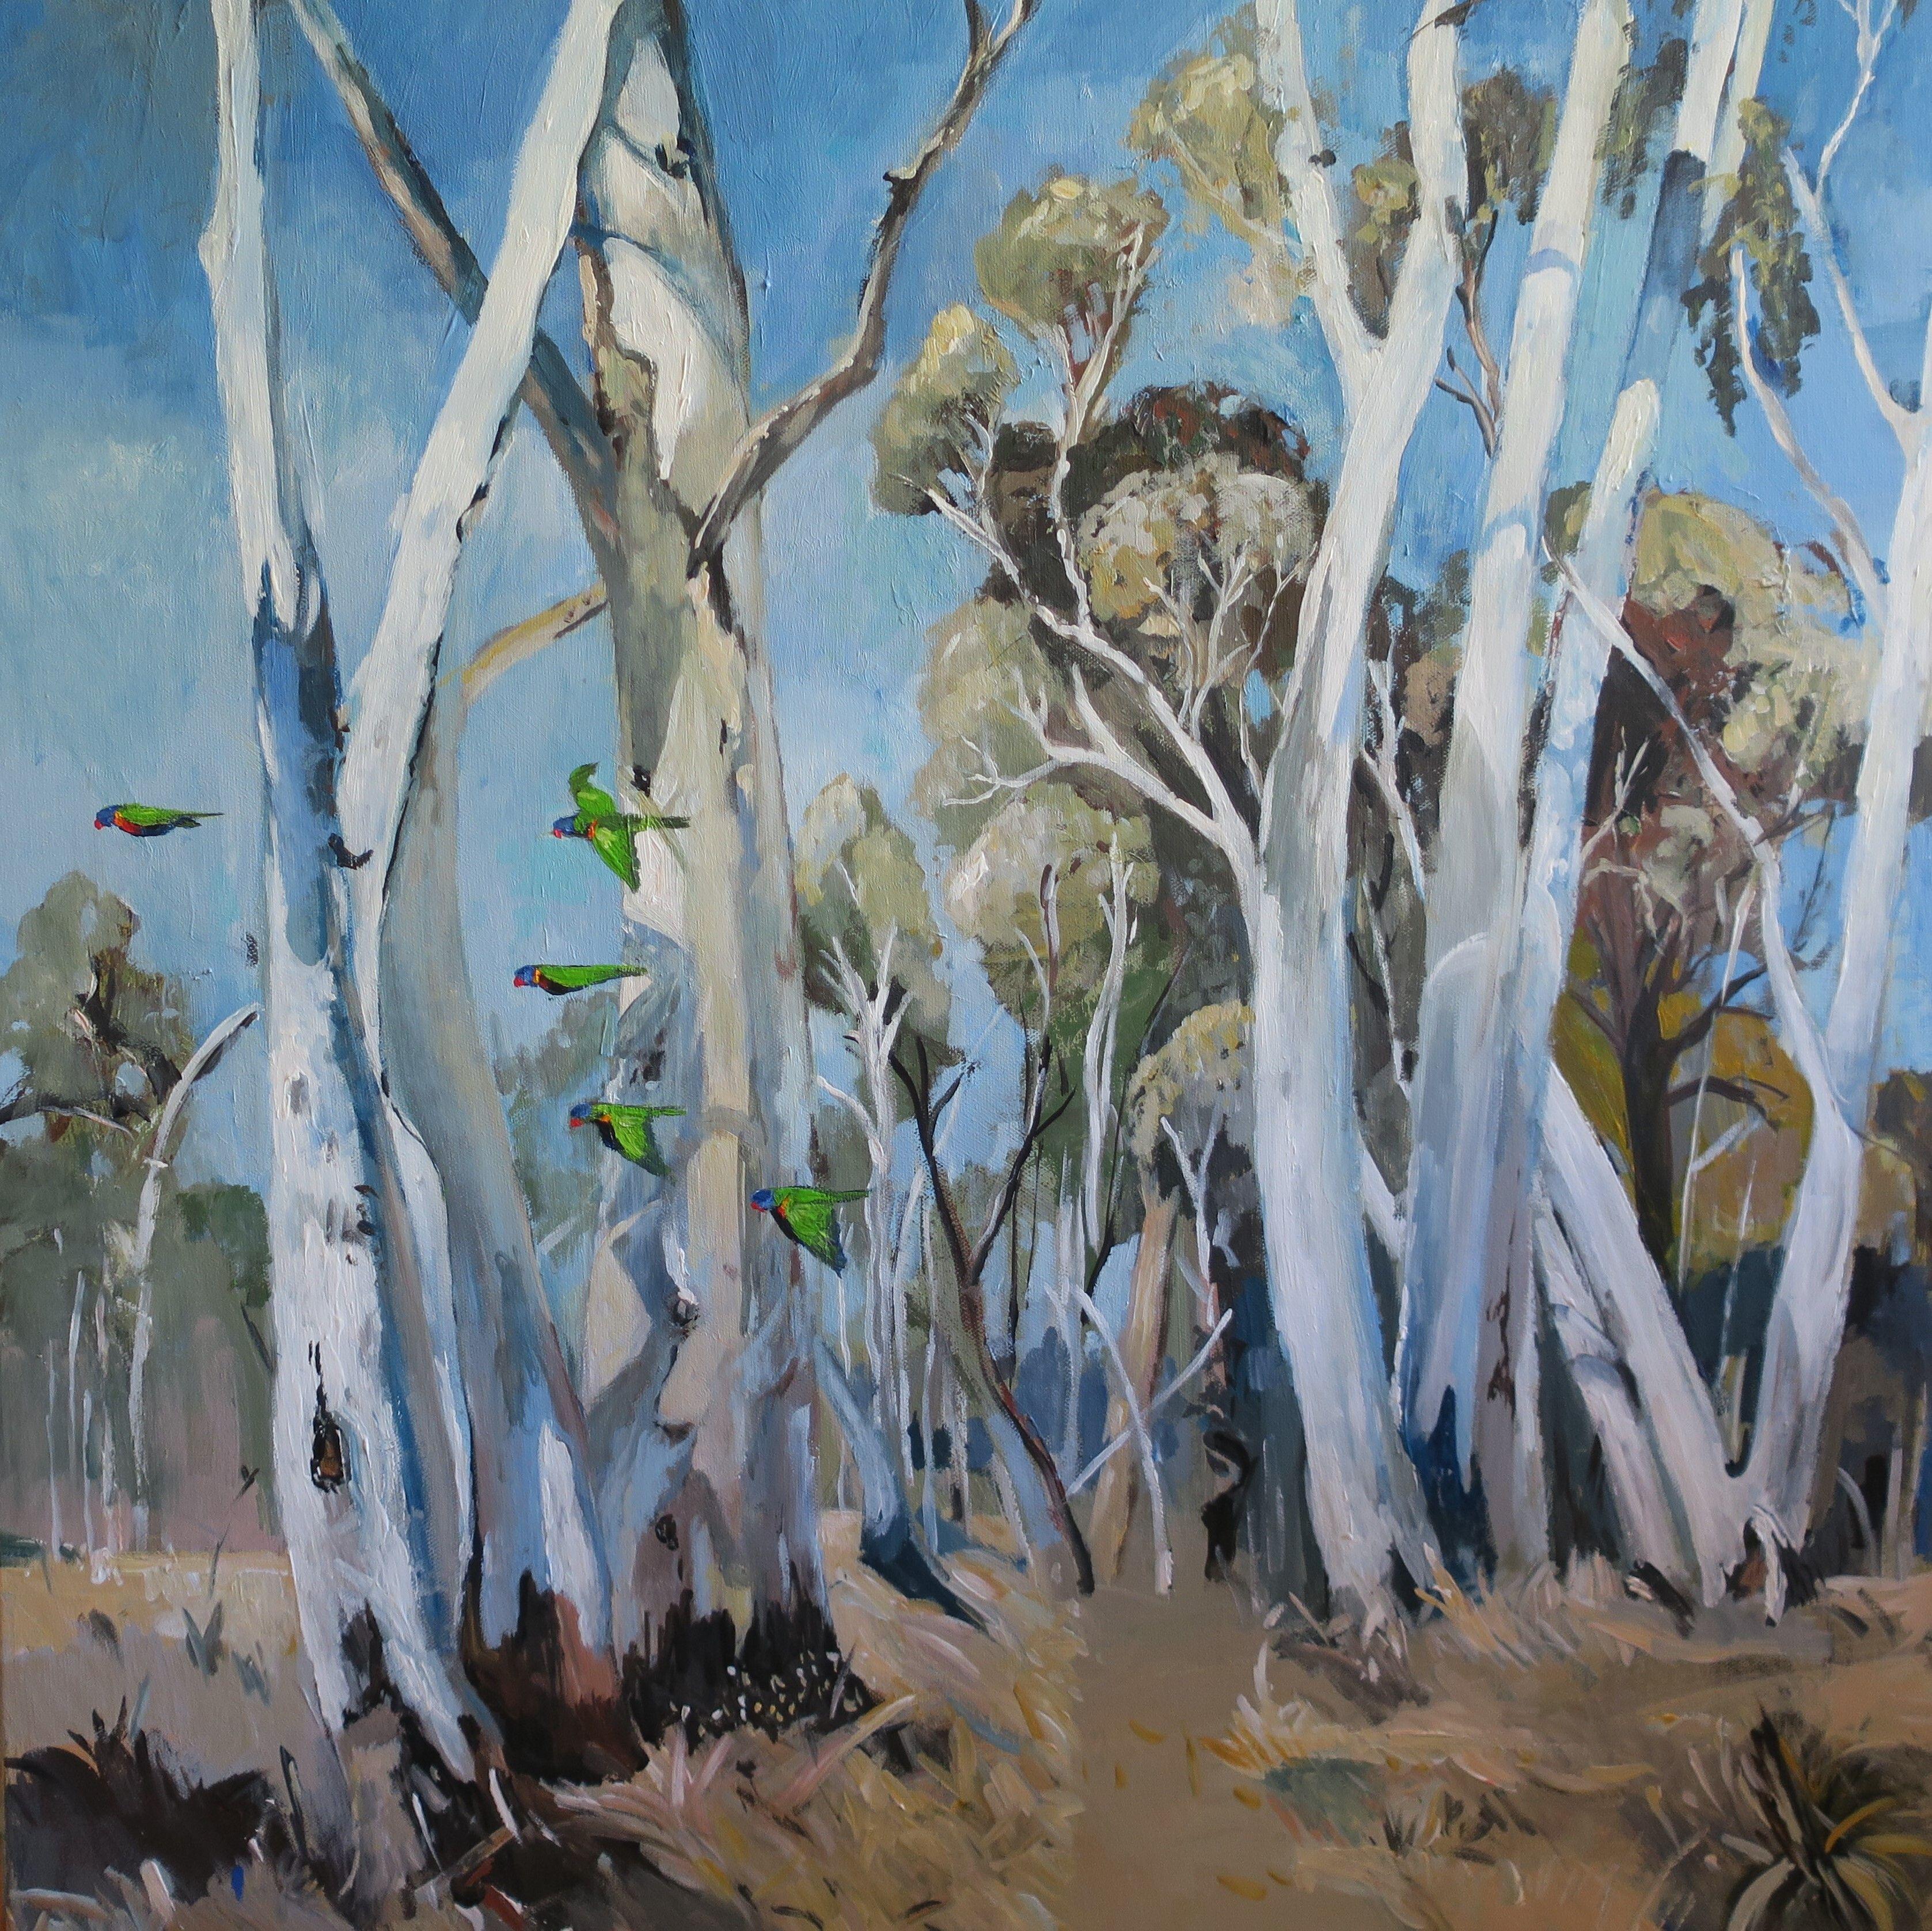 """Australian Landscape Gum Trees and Lorikeets"" by Susan"